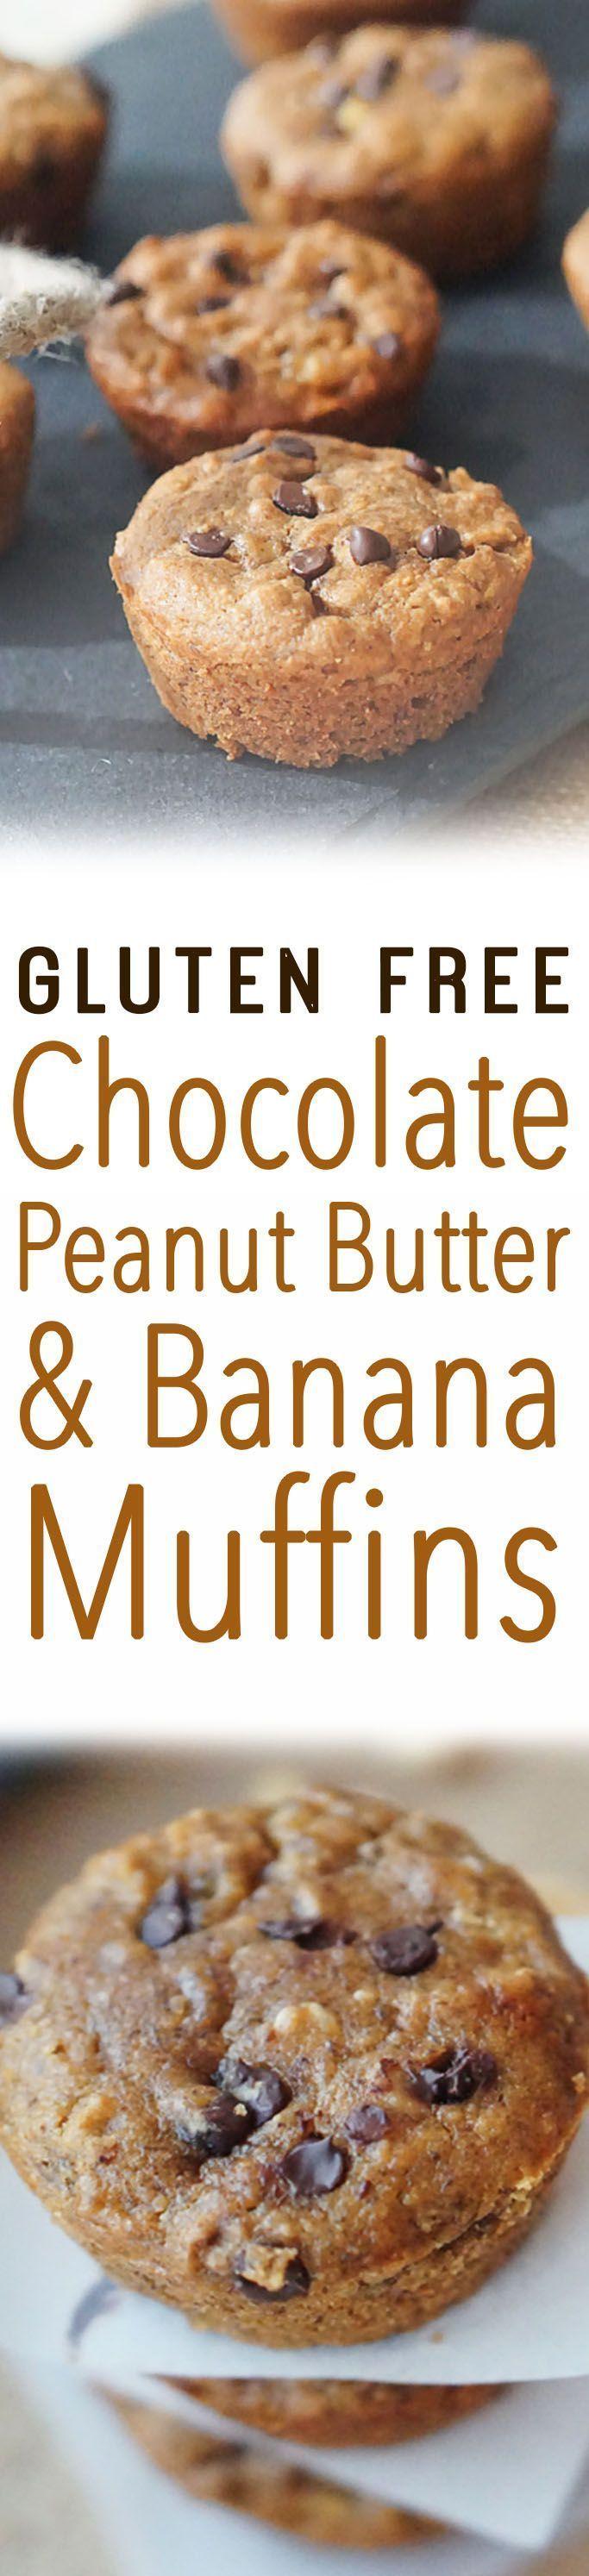 banana chocolate chocolate peanut butter banana muffins mmm muffins ...